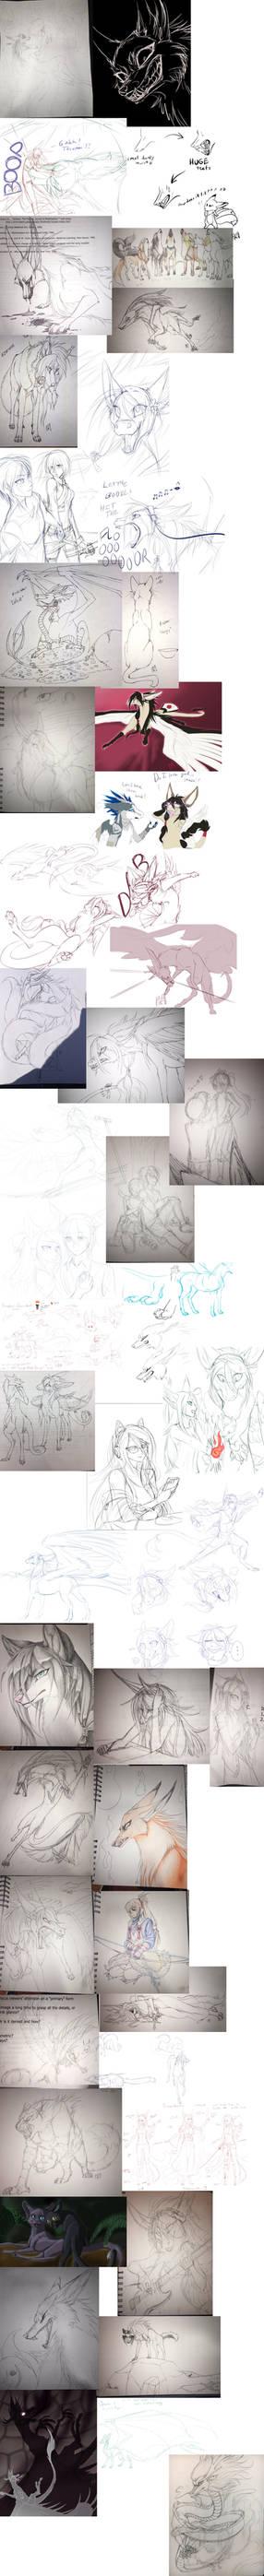 Massive Sketch Dump 2016